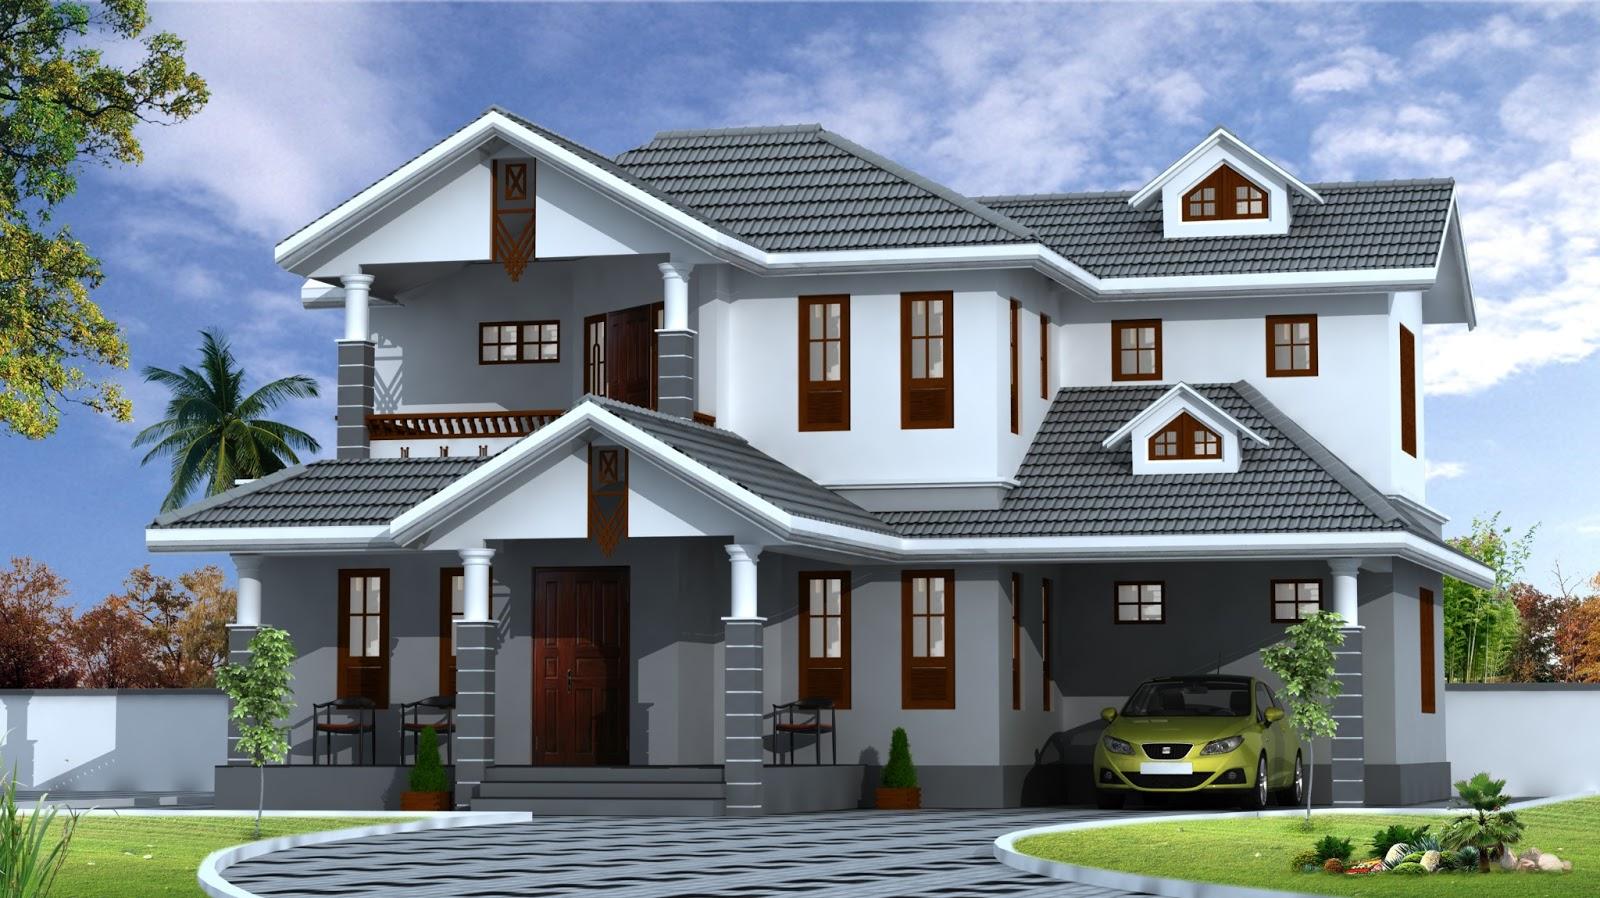 Genial HOUSE DESIGNS